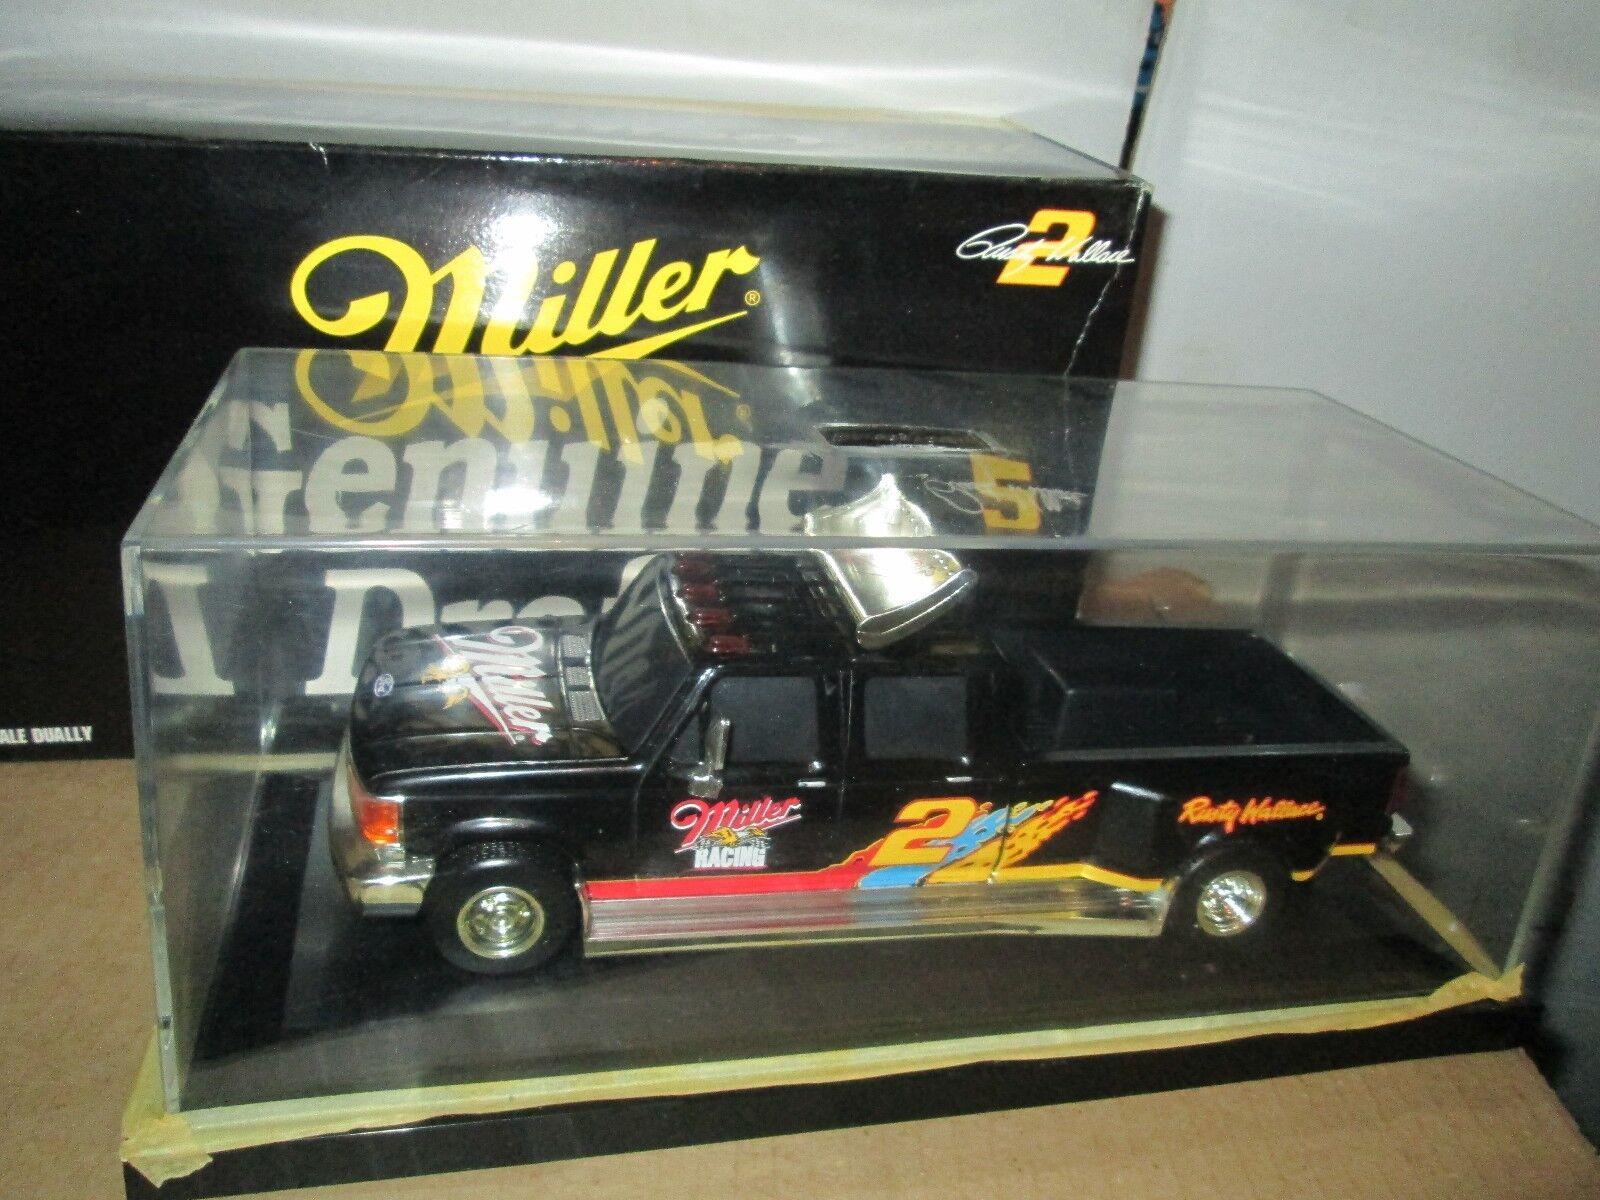 Ford F350 Dual 1 Ton Rostige Wallace 1 24 Truck 4dr Doppelkabine Miller Echt